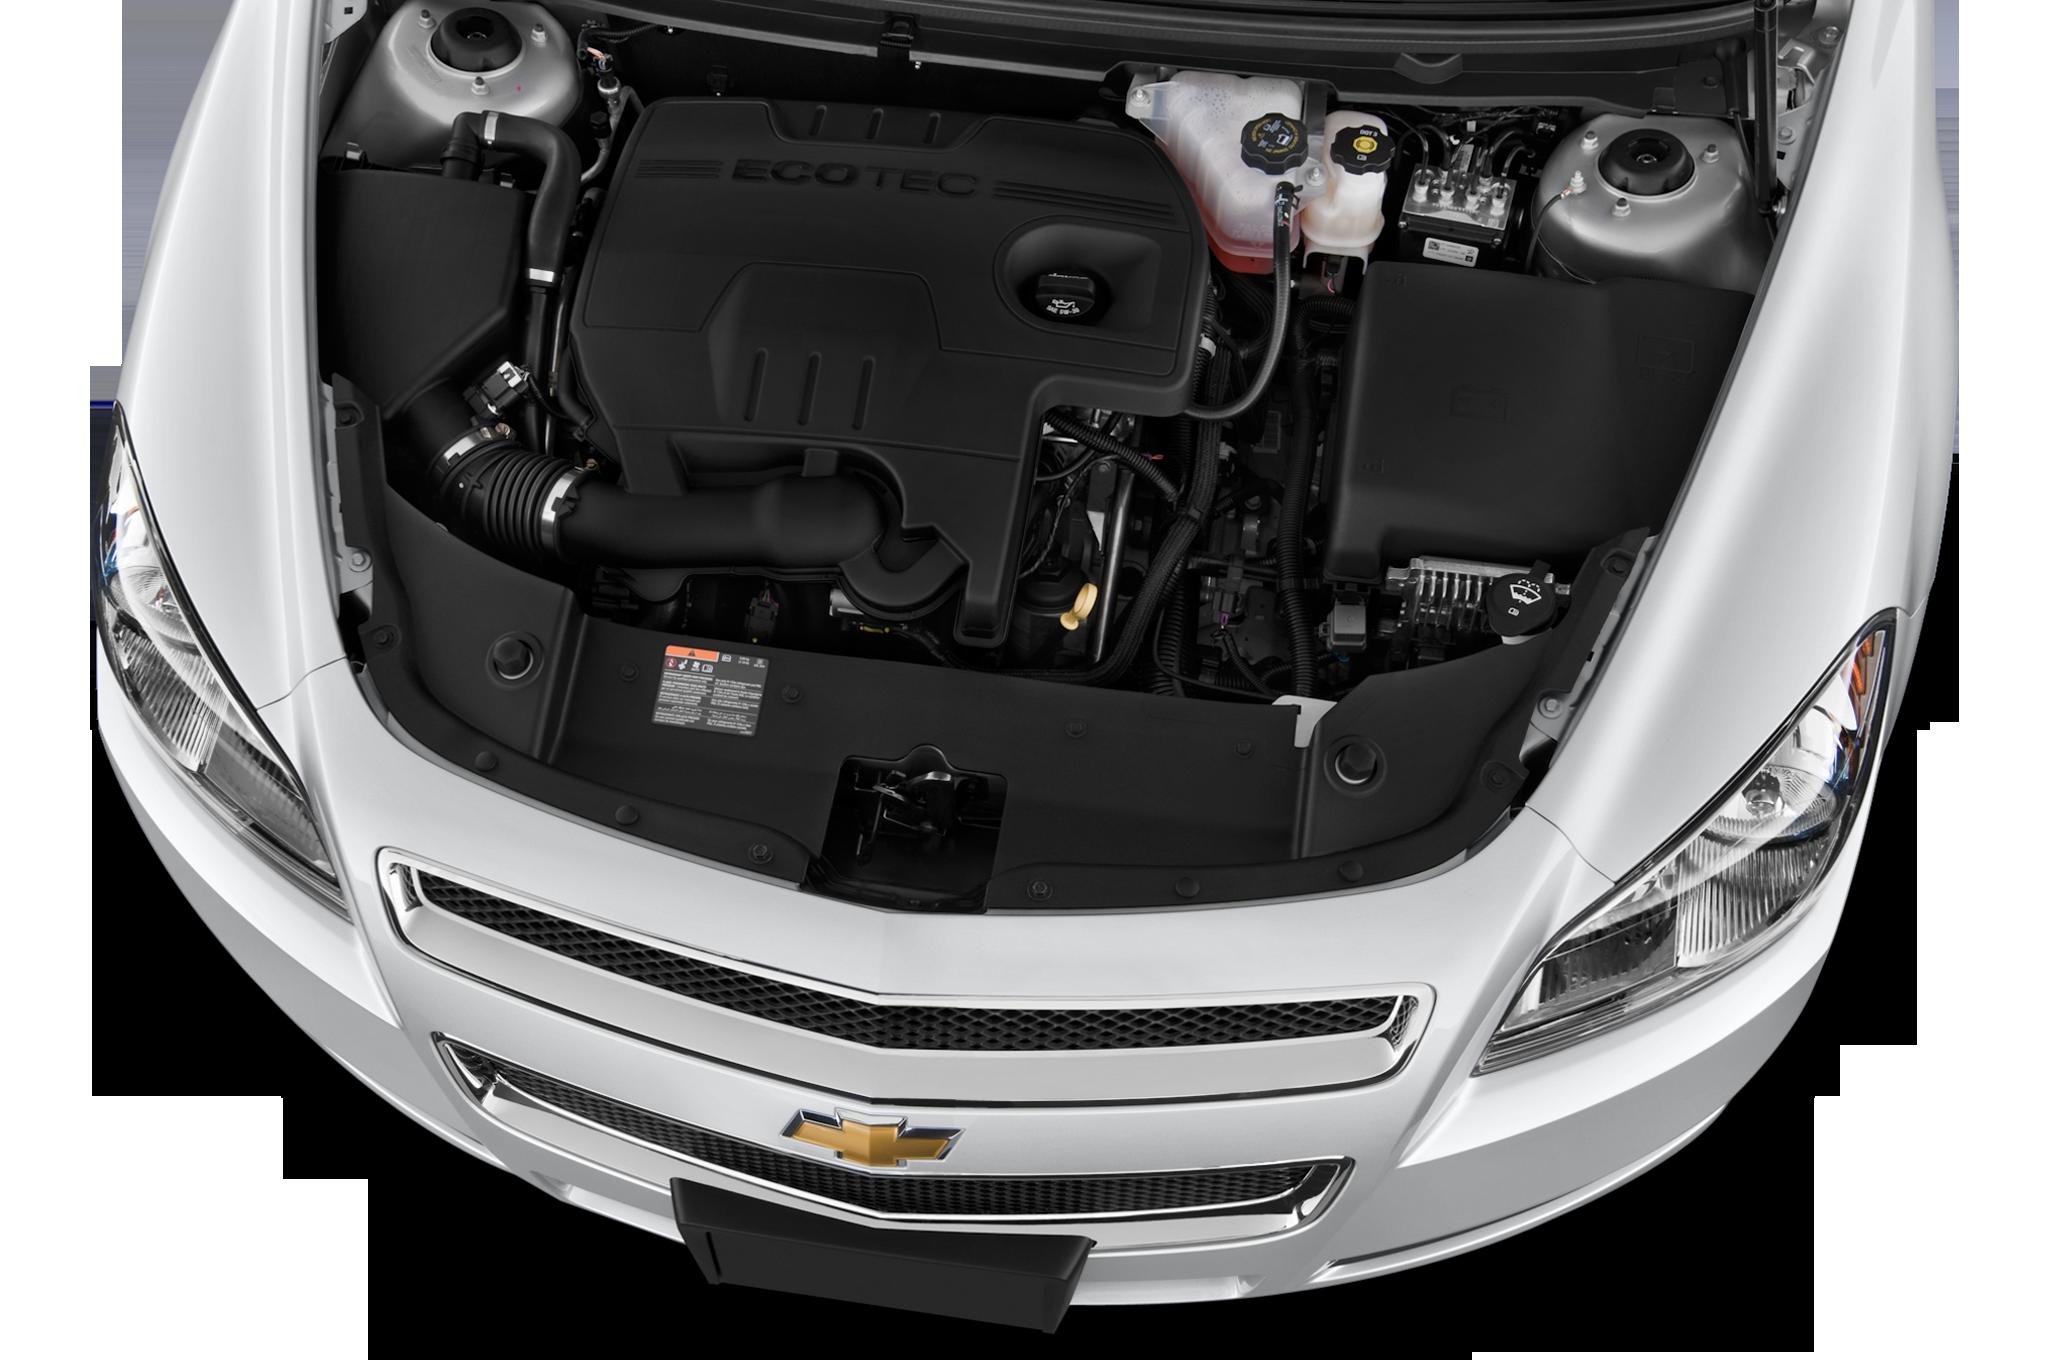 2010 Chevrolet Malibu LTZ - Automobile Magazine